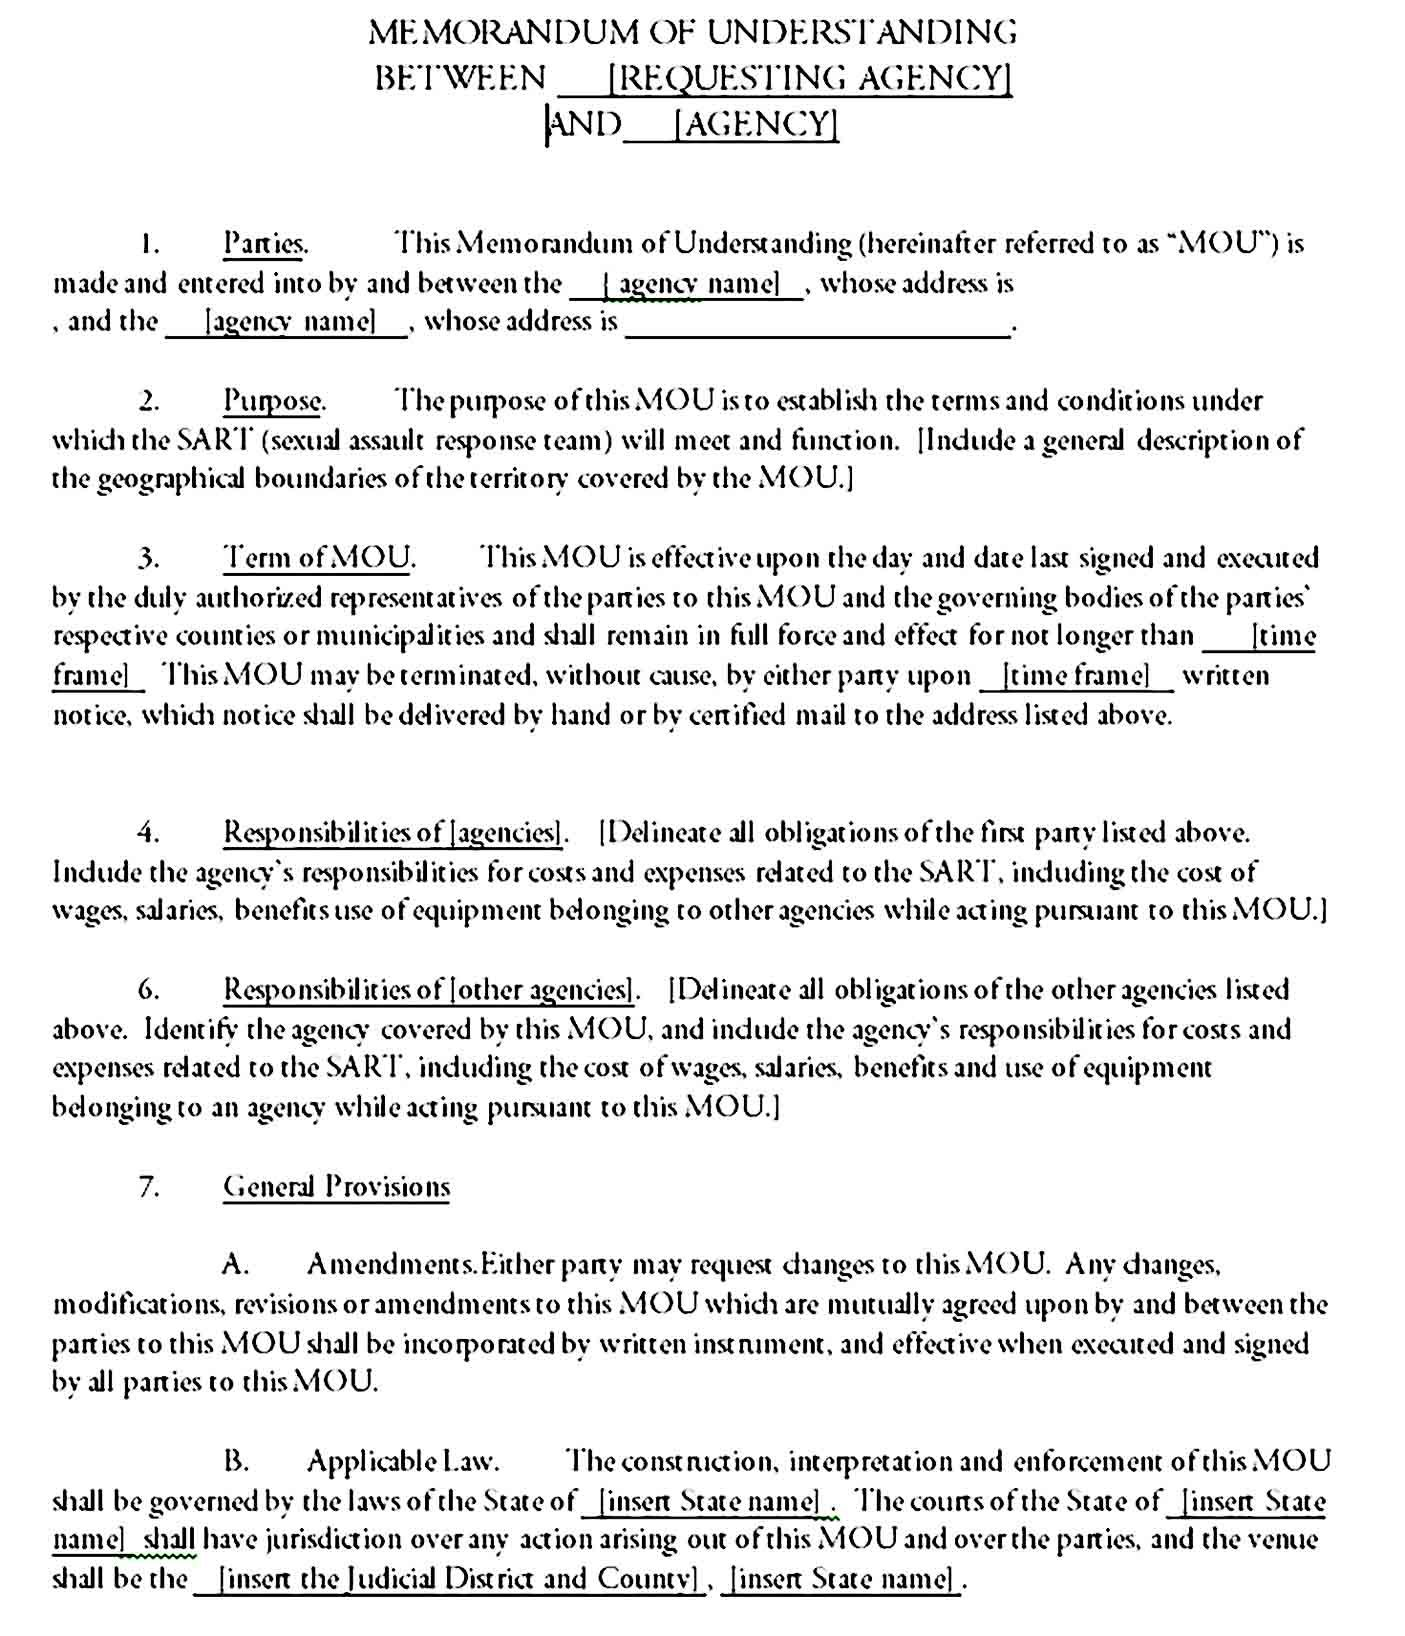 Memorandum Of Understanding Template Printable In 2020 Memorandum Understanding Template Printable